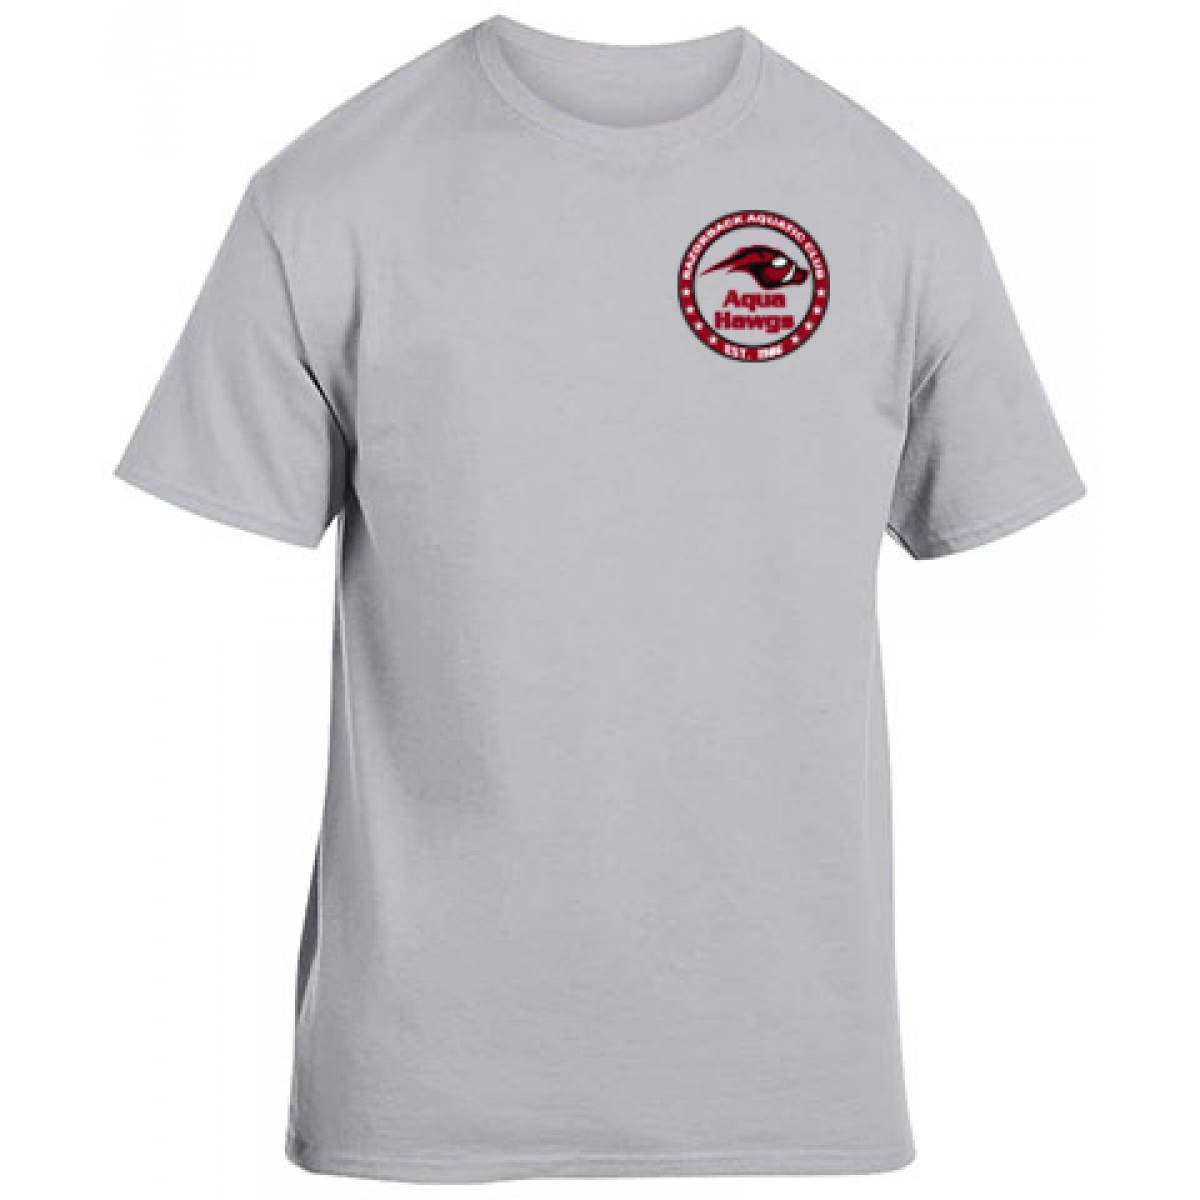 Cotton Short Sleeve T-Shirt Gray-Gray -YM